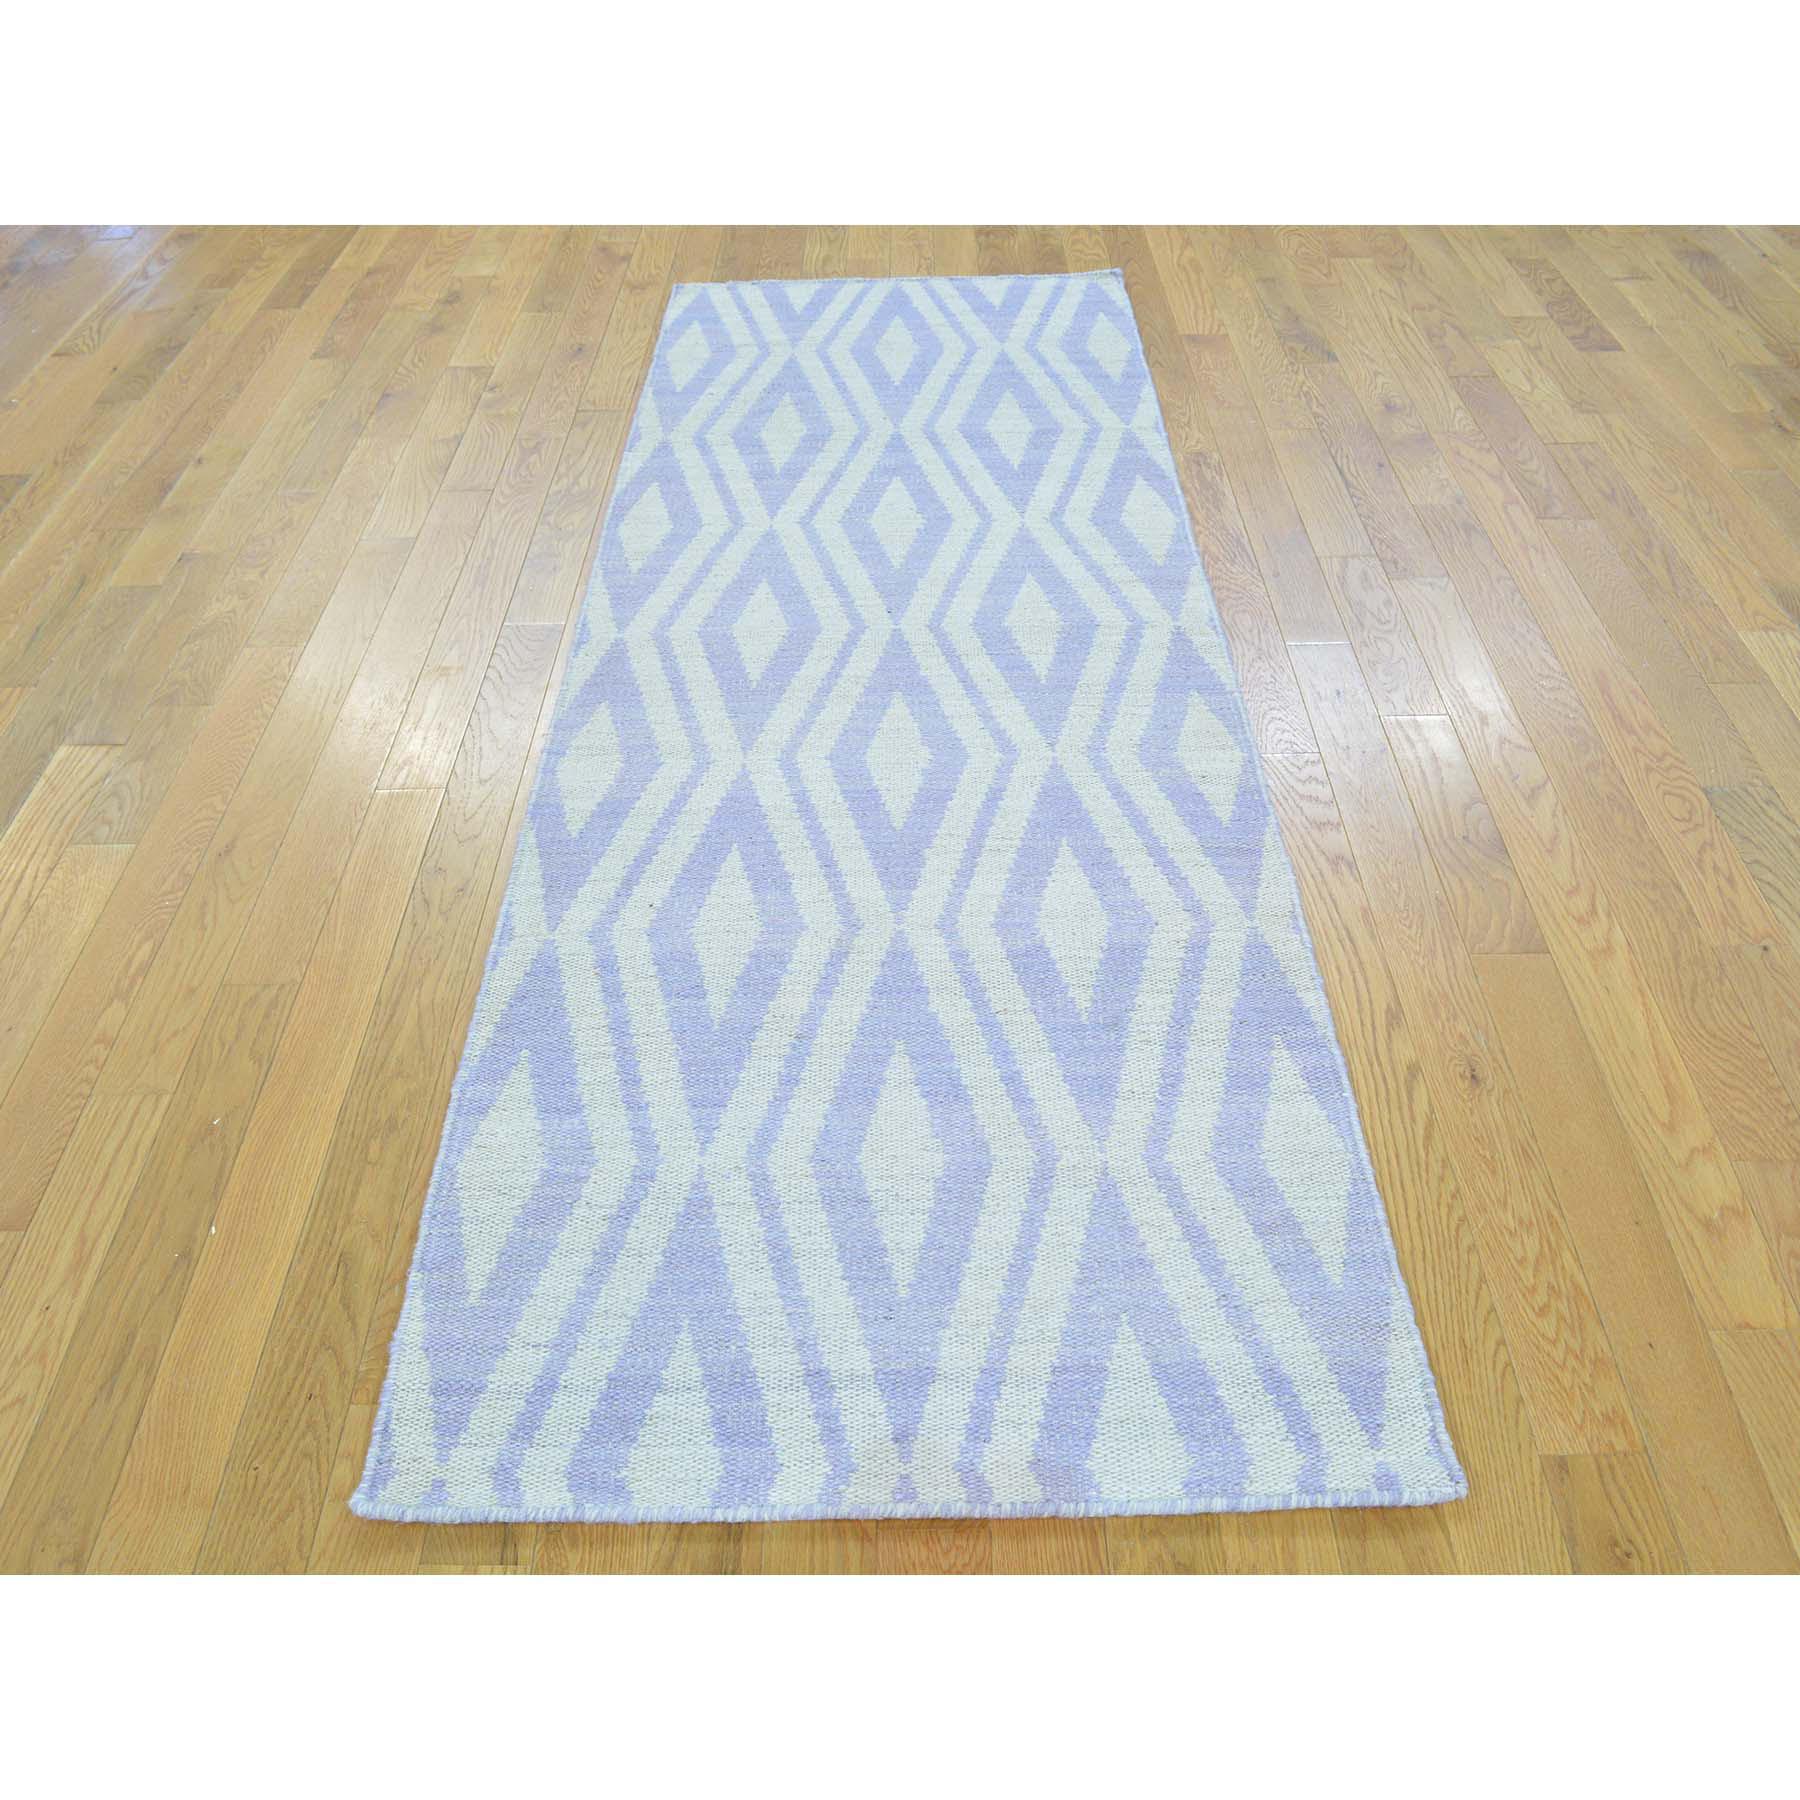 2-8 x8- Reversible Runner Flat Weave Killim Hand Woven Oriental Rug